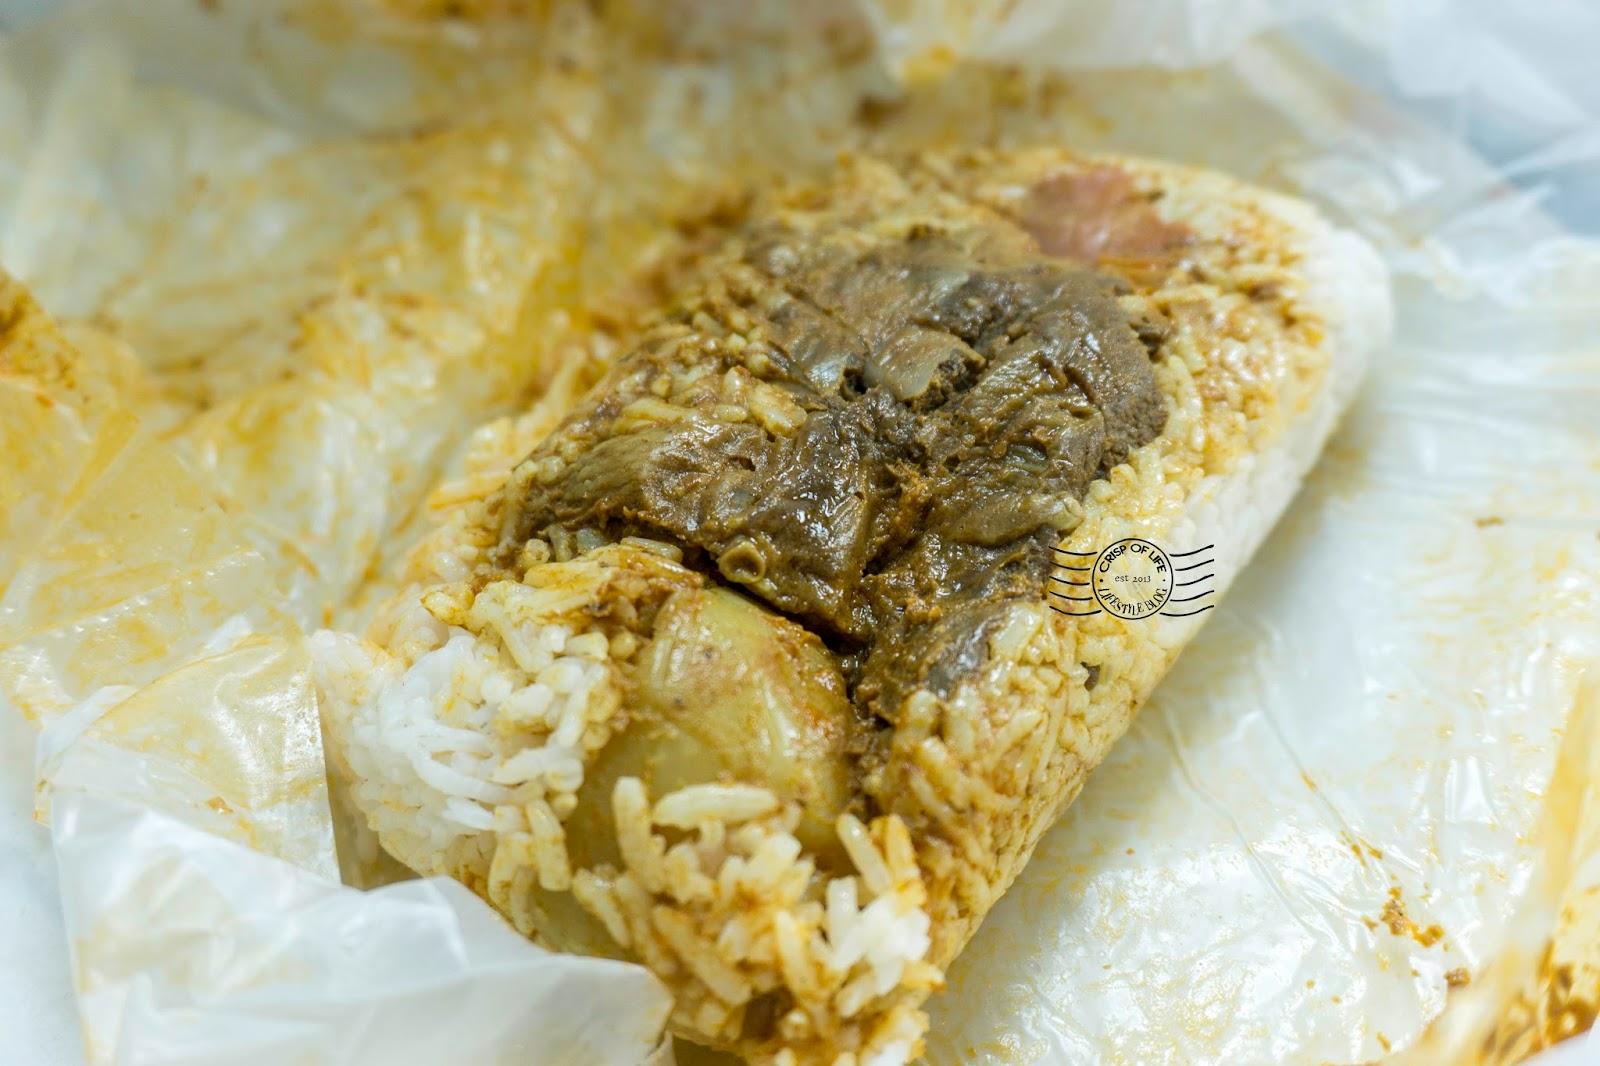 亚清七爷咖喱饭 Ah Ching Nasi Lemak